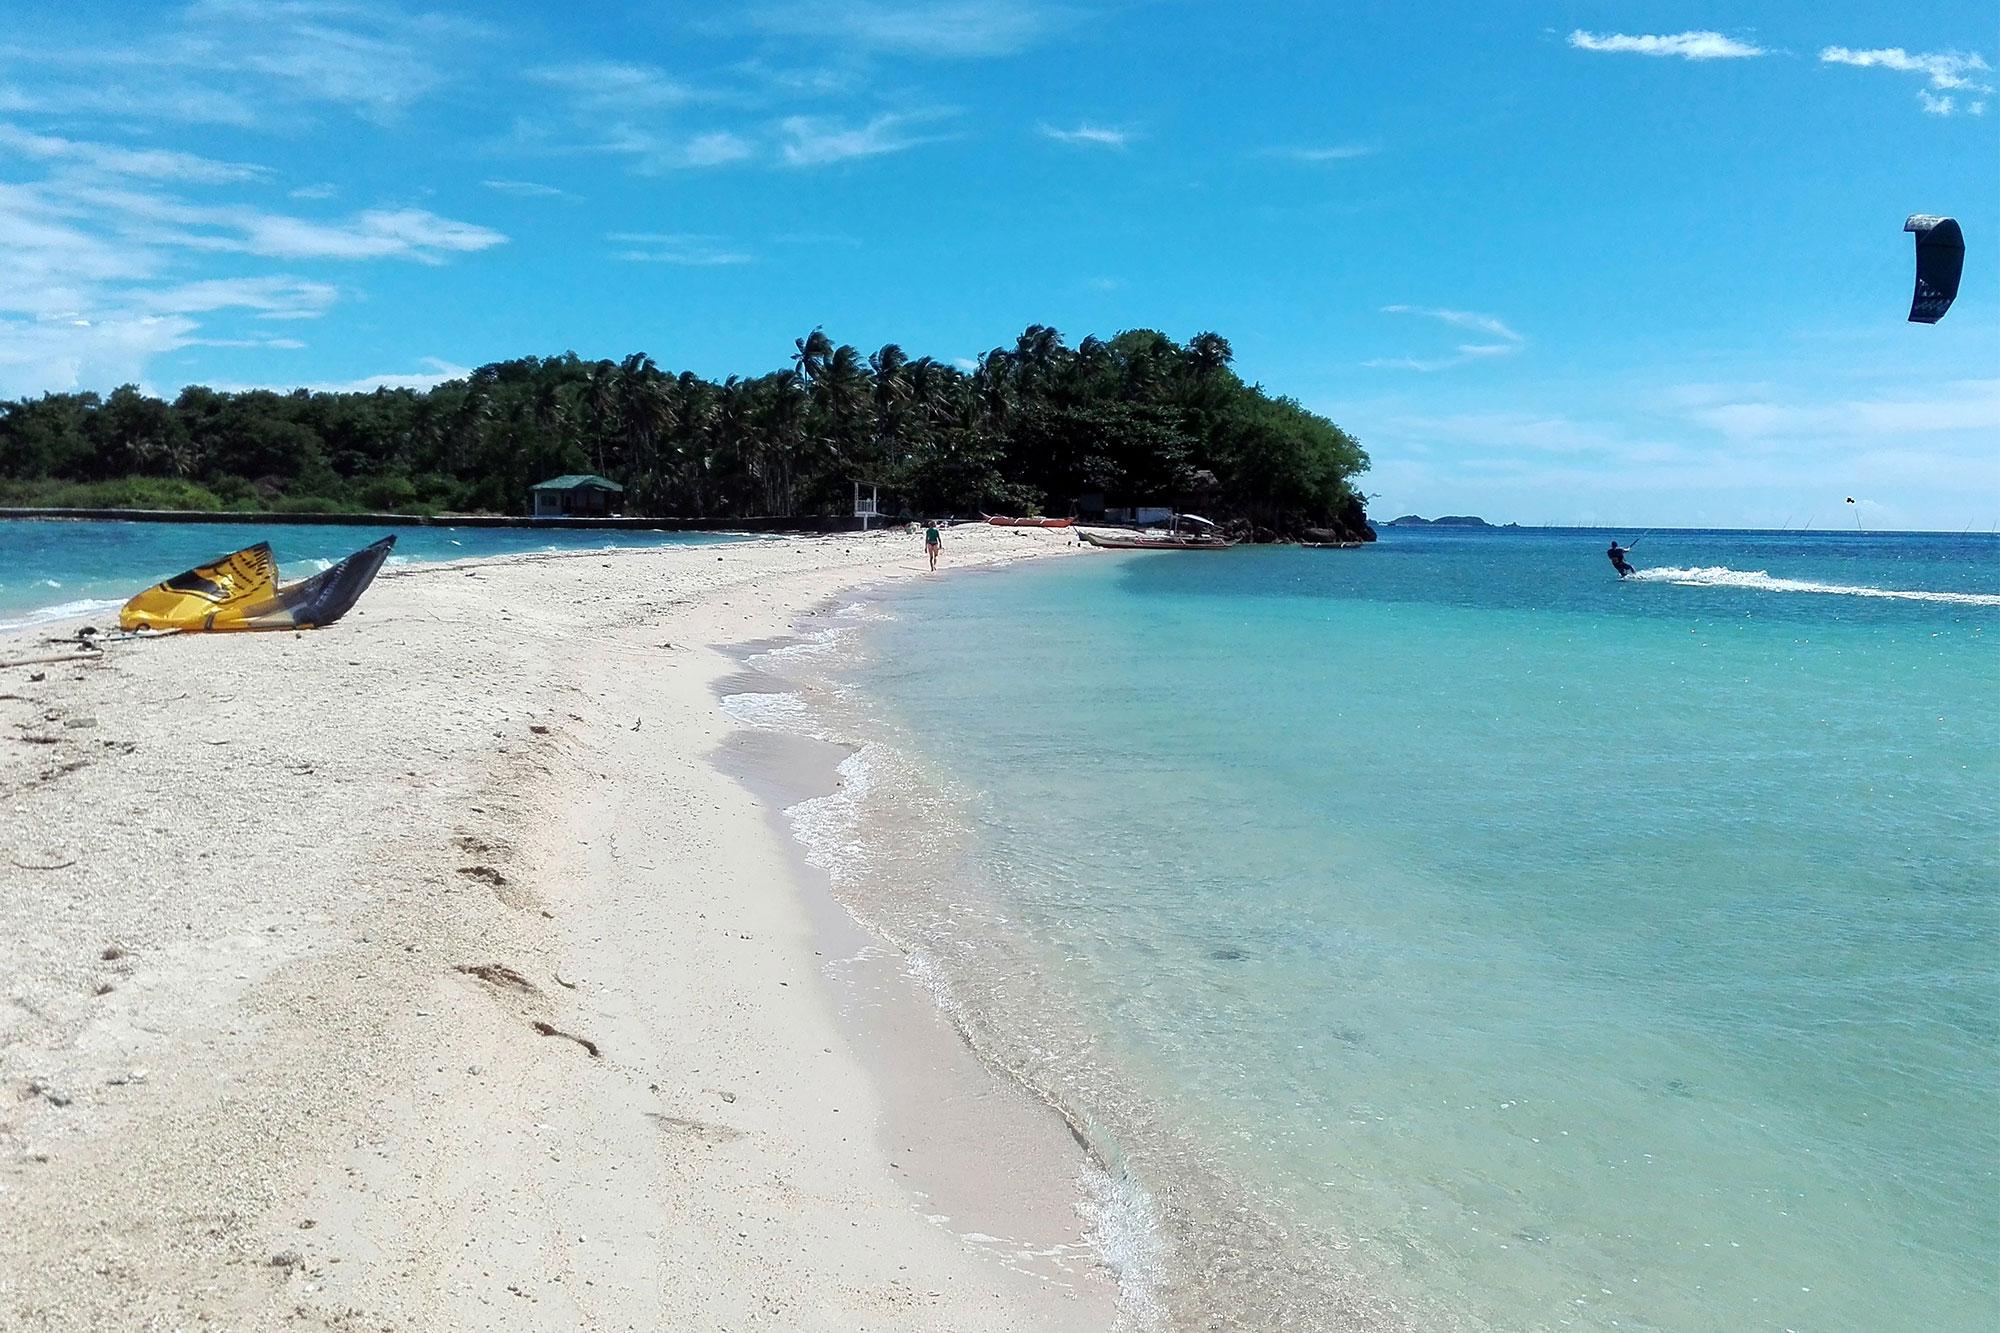 Kiten auf Mindoro